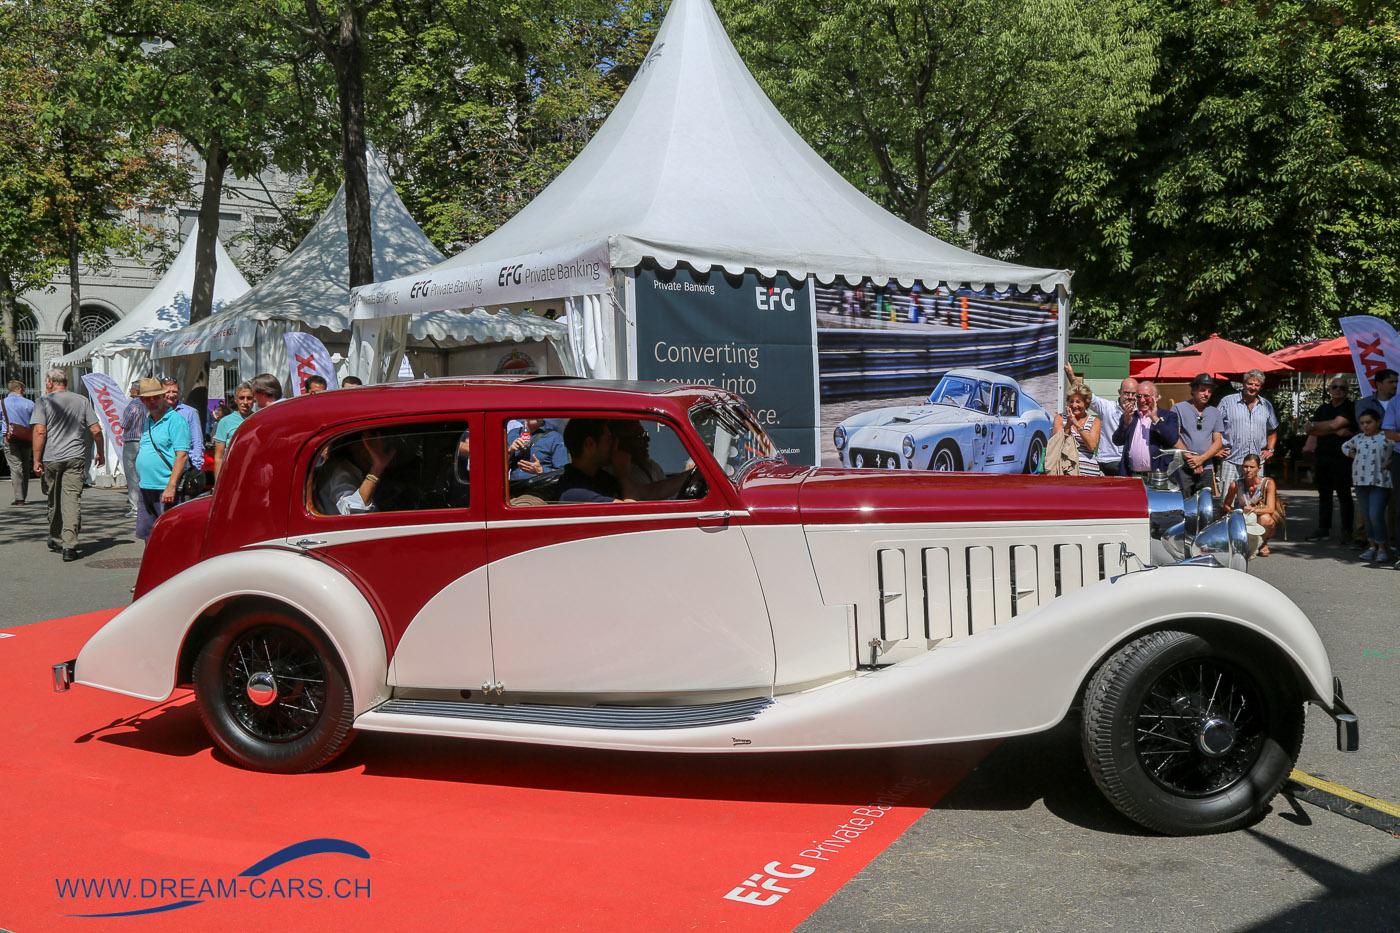 ZCCA - Zürich Classic Car Award, 22. August 2018. Der Hispano-Suiza gewann den Publikumspreis